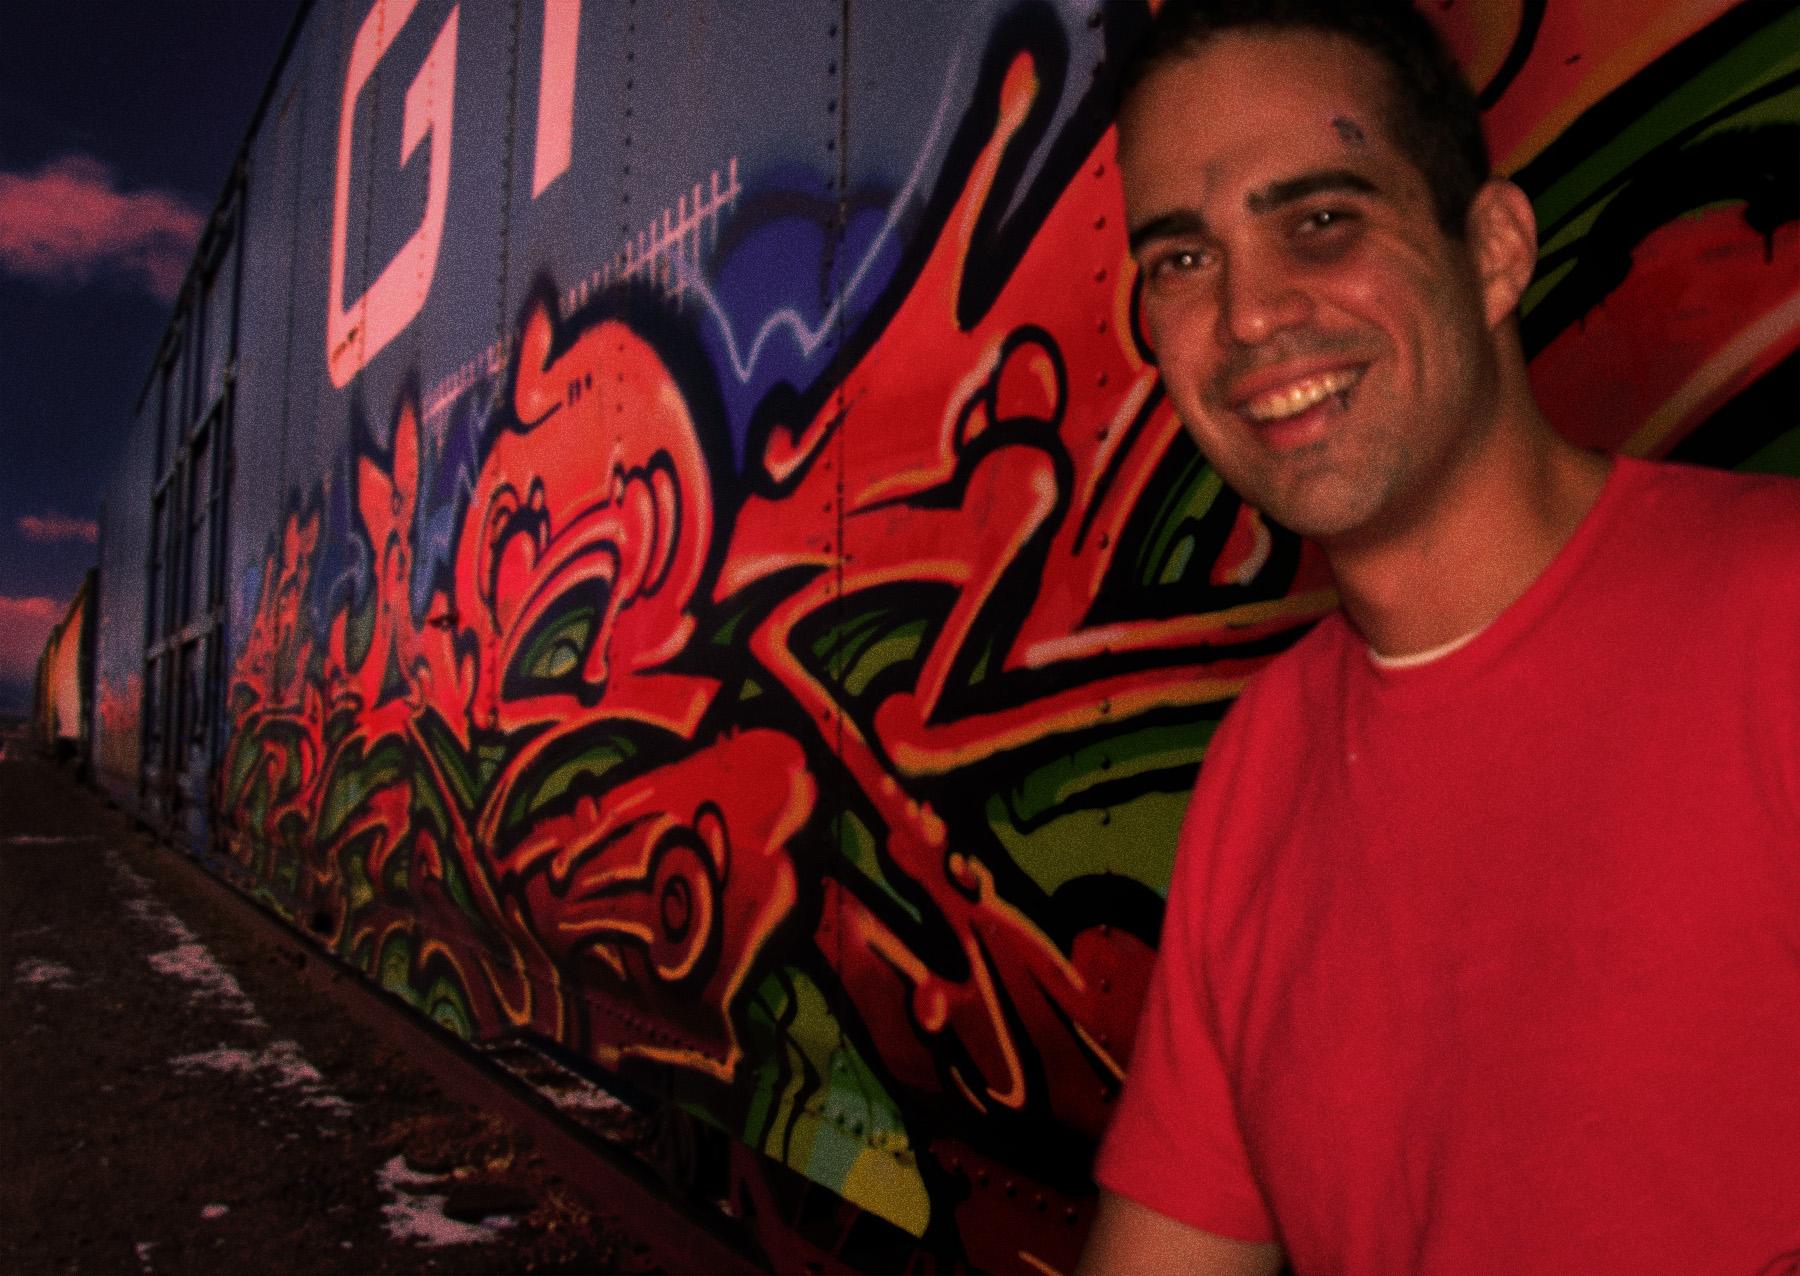 6-2-Grafitti.jpg